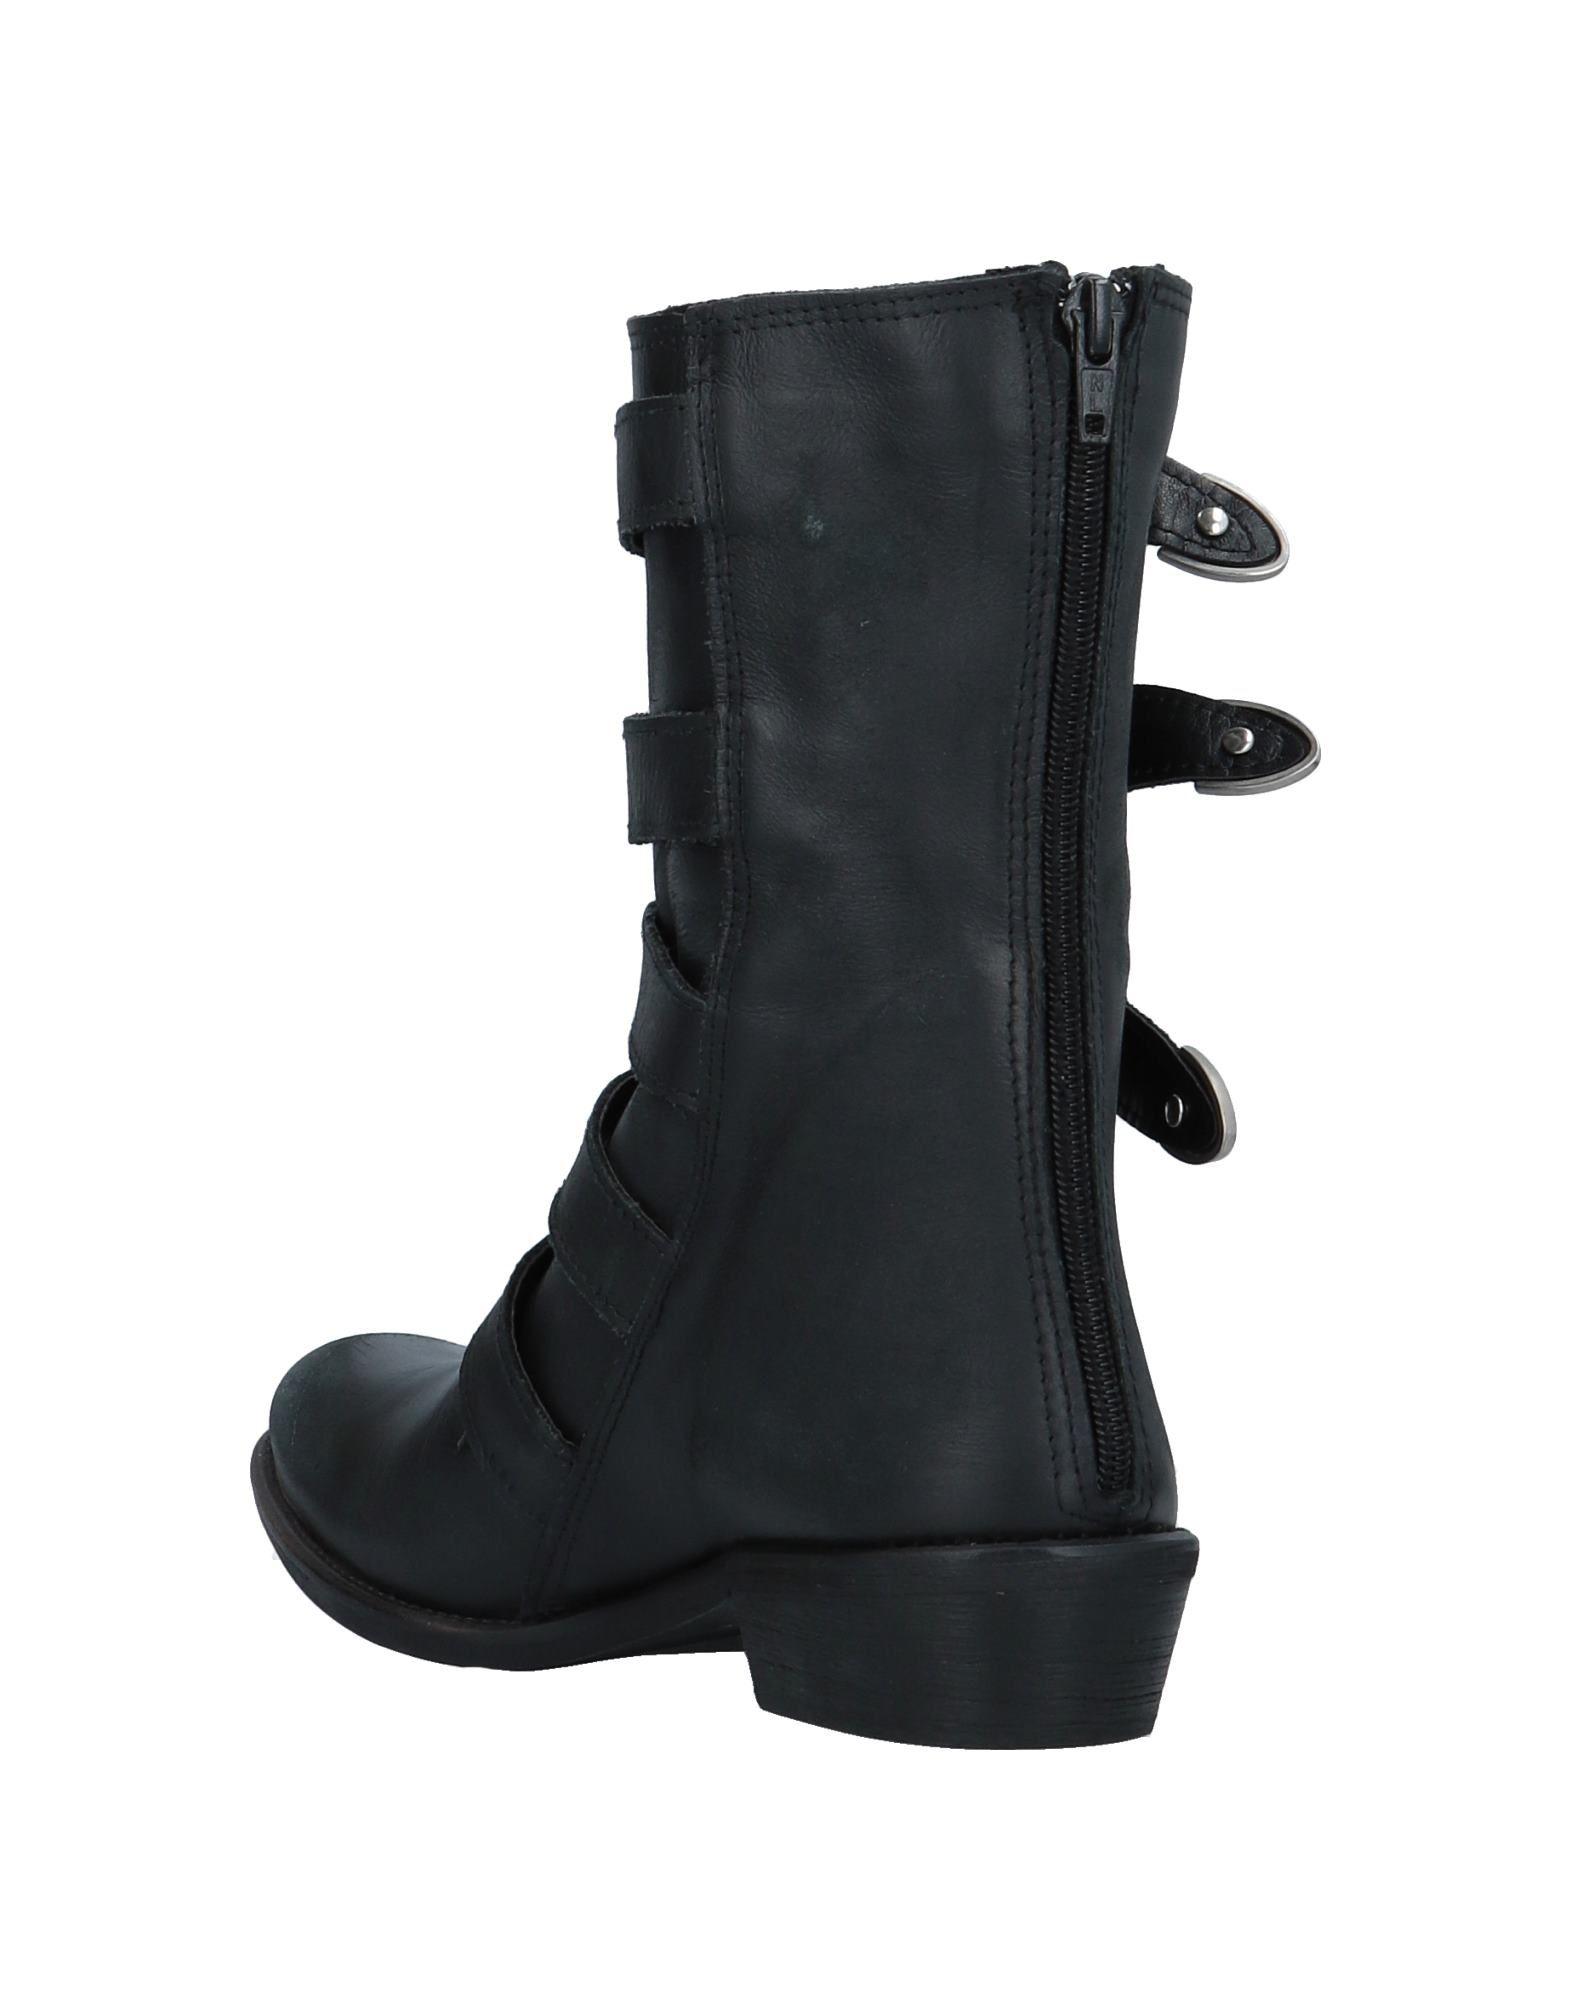 J.Born Stiefelette Damen   Damen 11532895FT Heiße Schuhe 7a9168